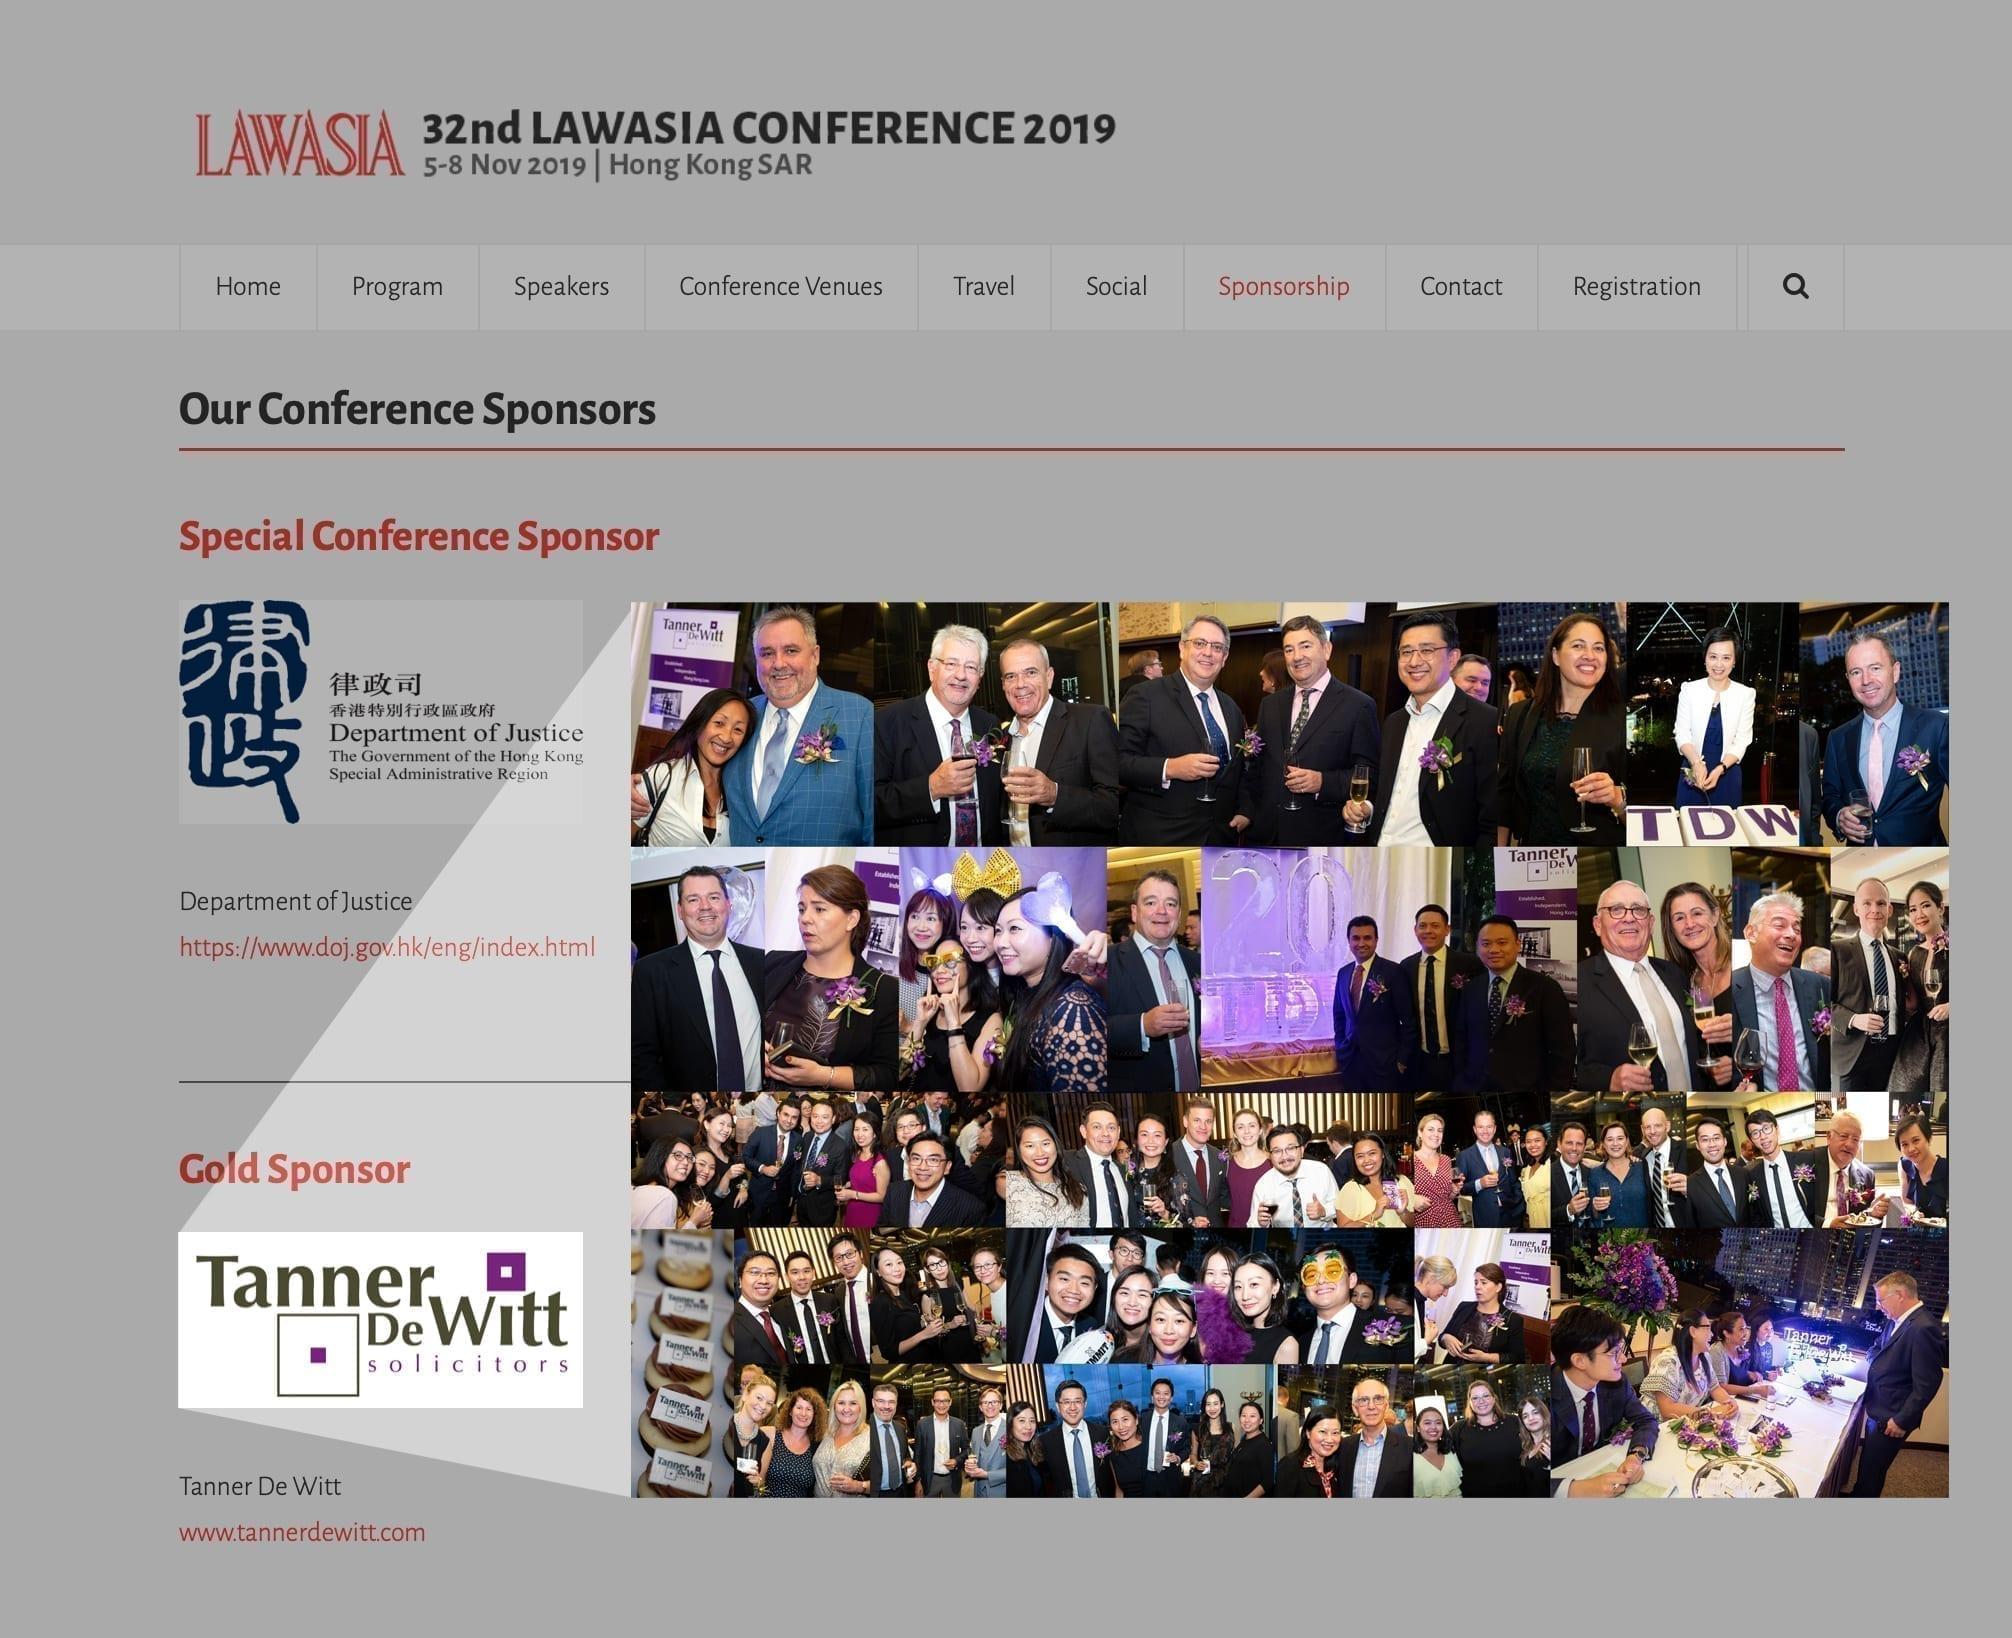 Tanner De Witt is a proud sponsor of LAWASIA 32 in Hong Kong